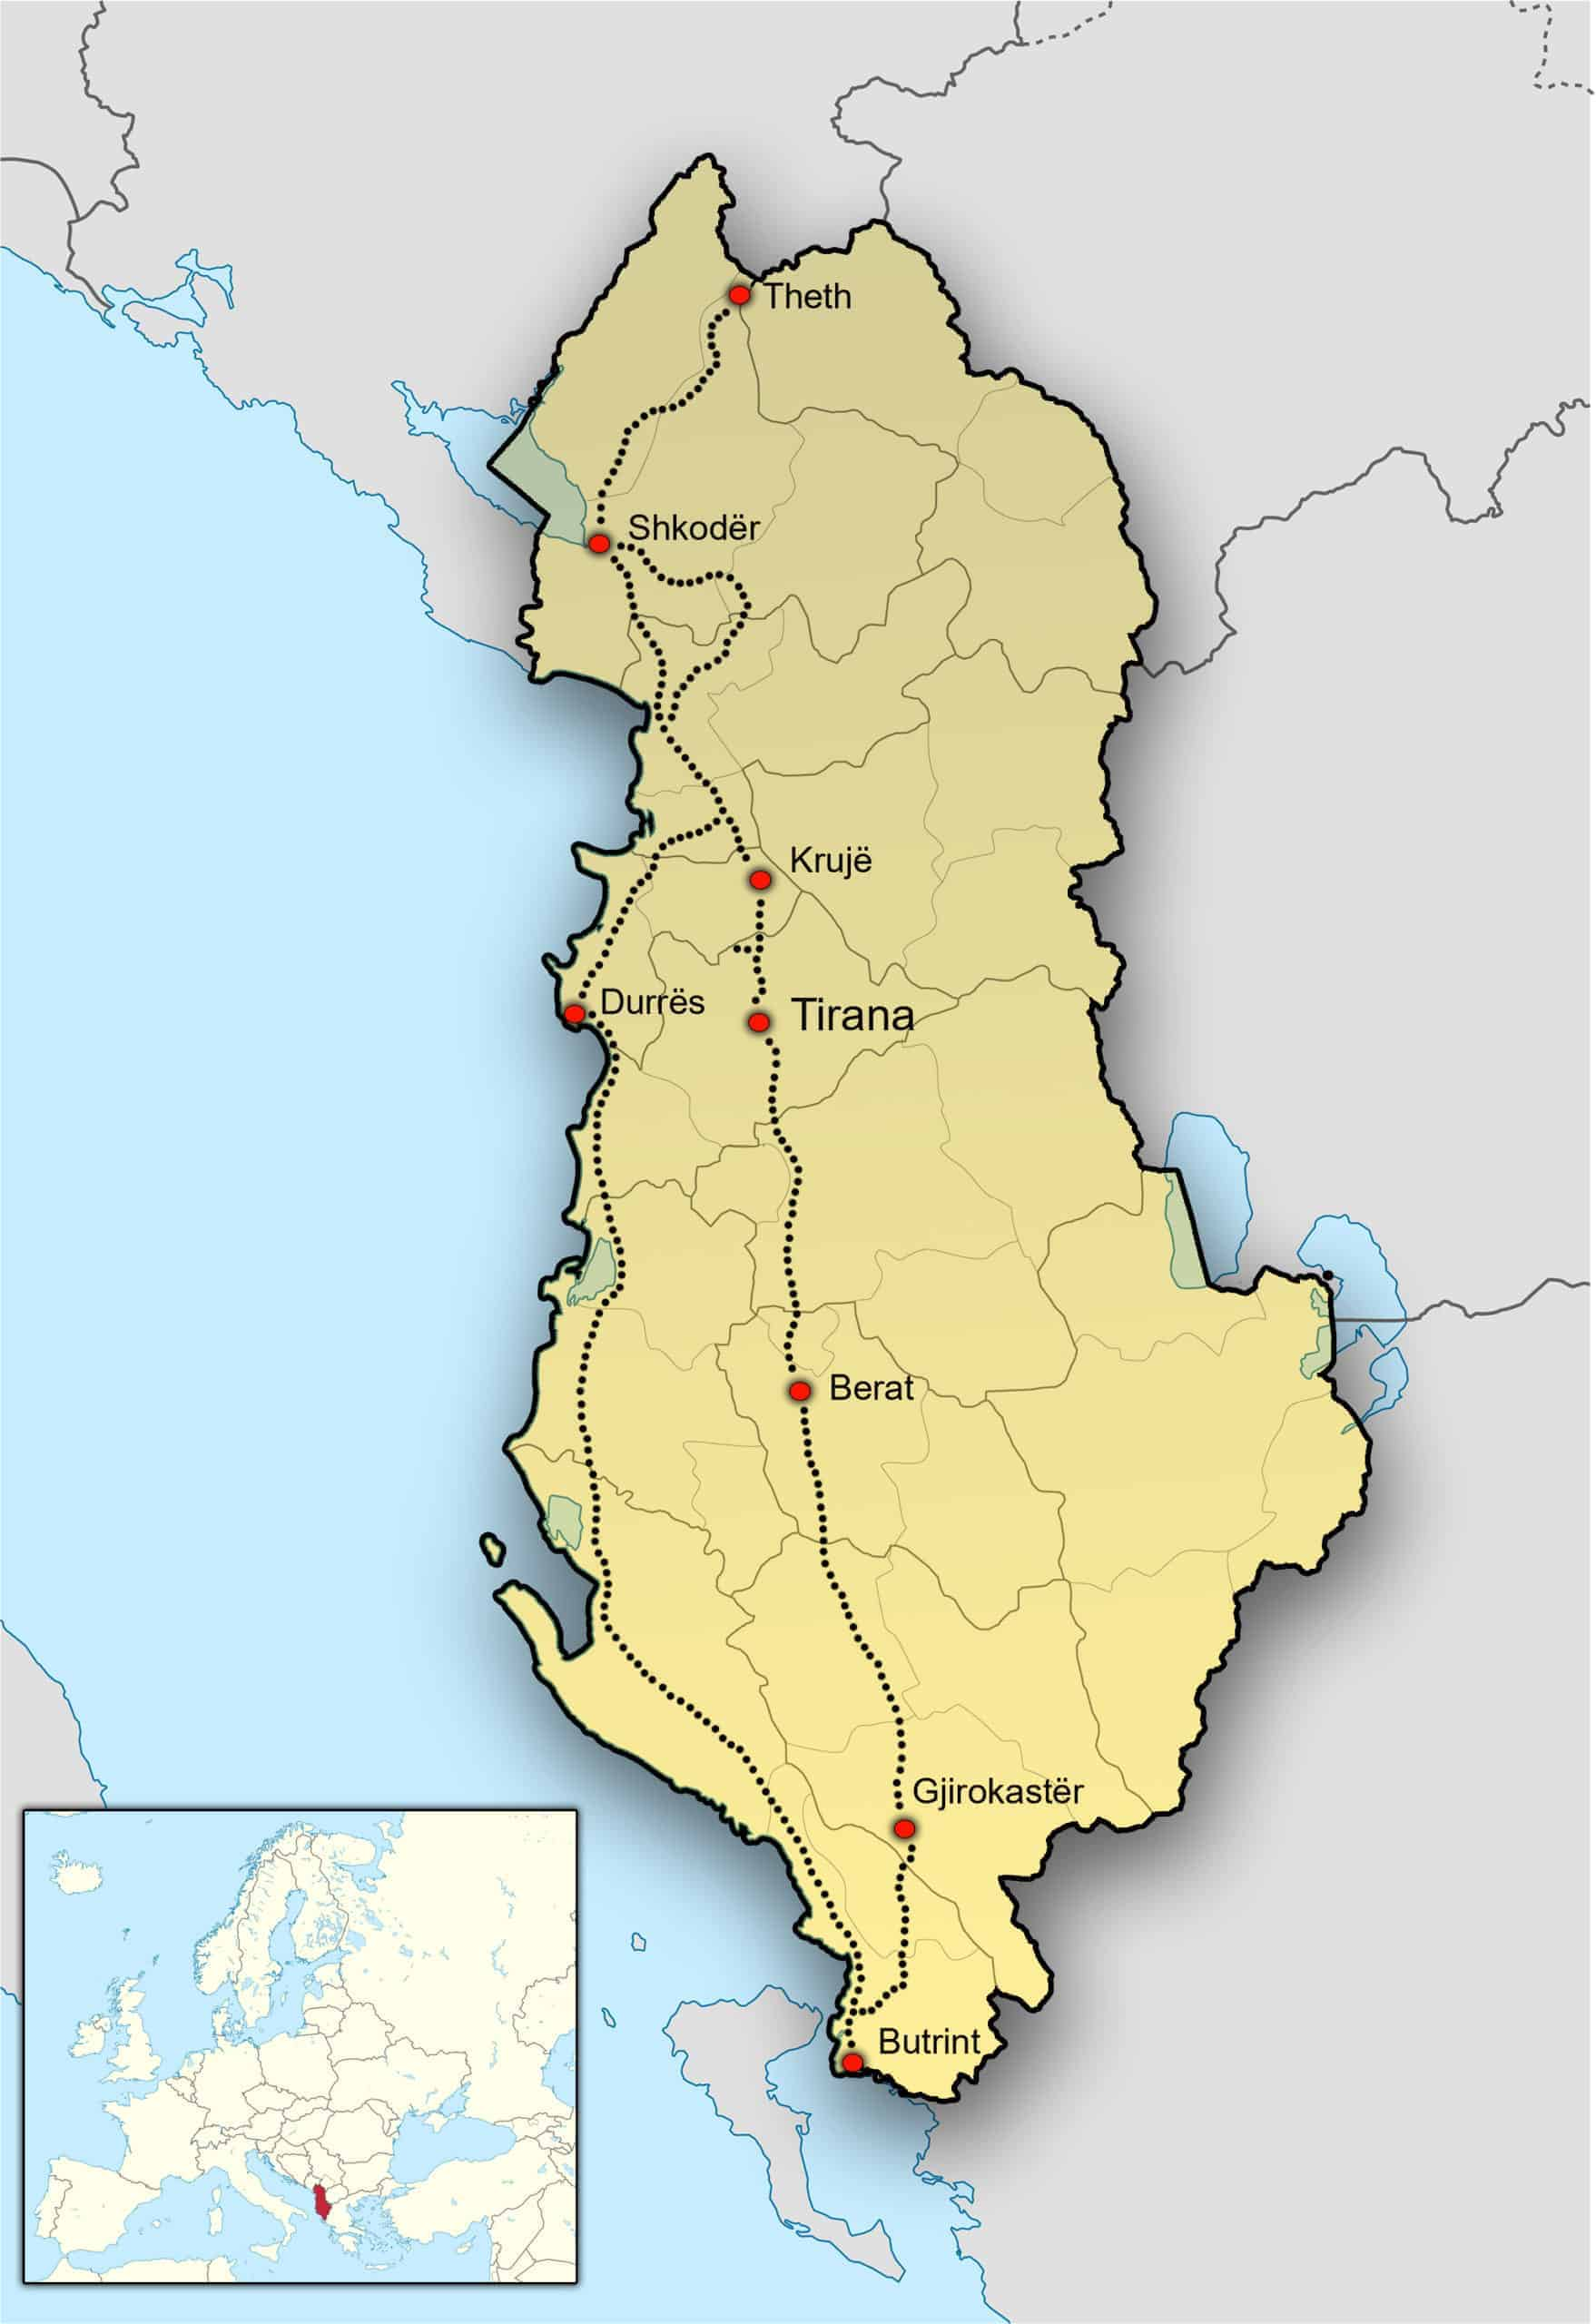 Kaart van Albanië